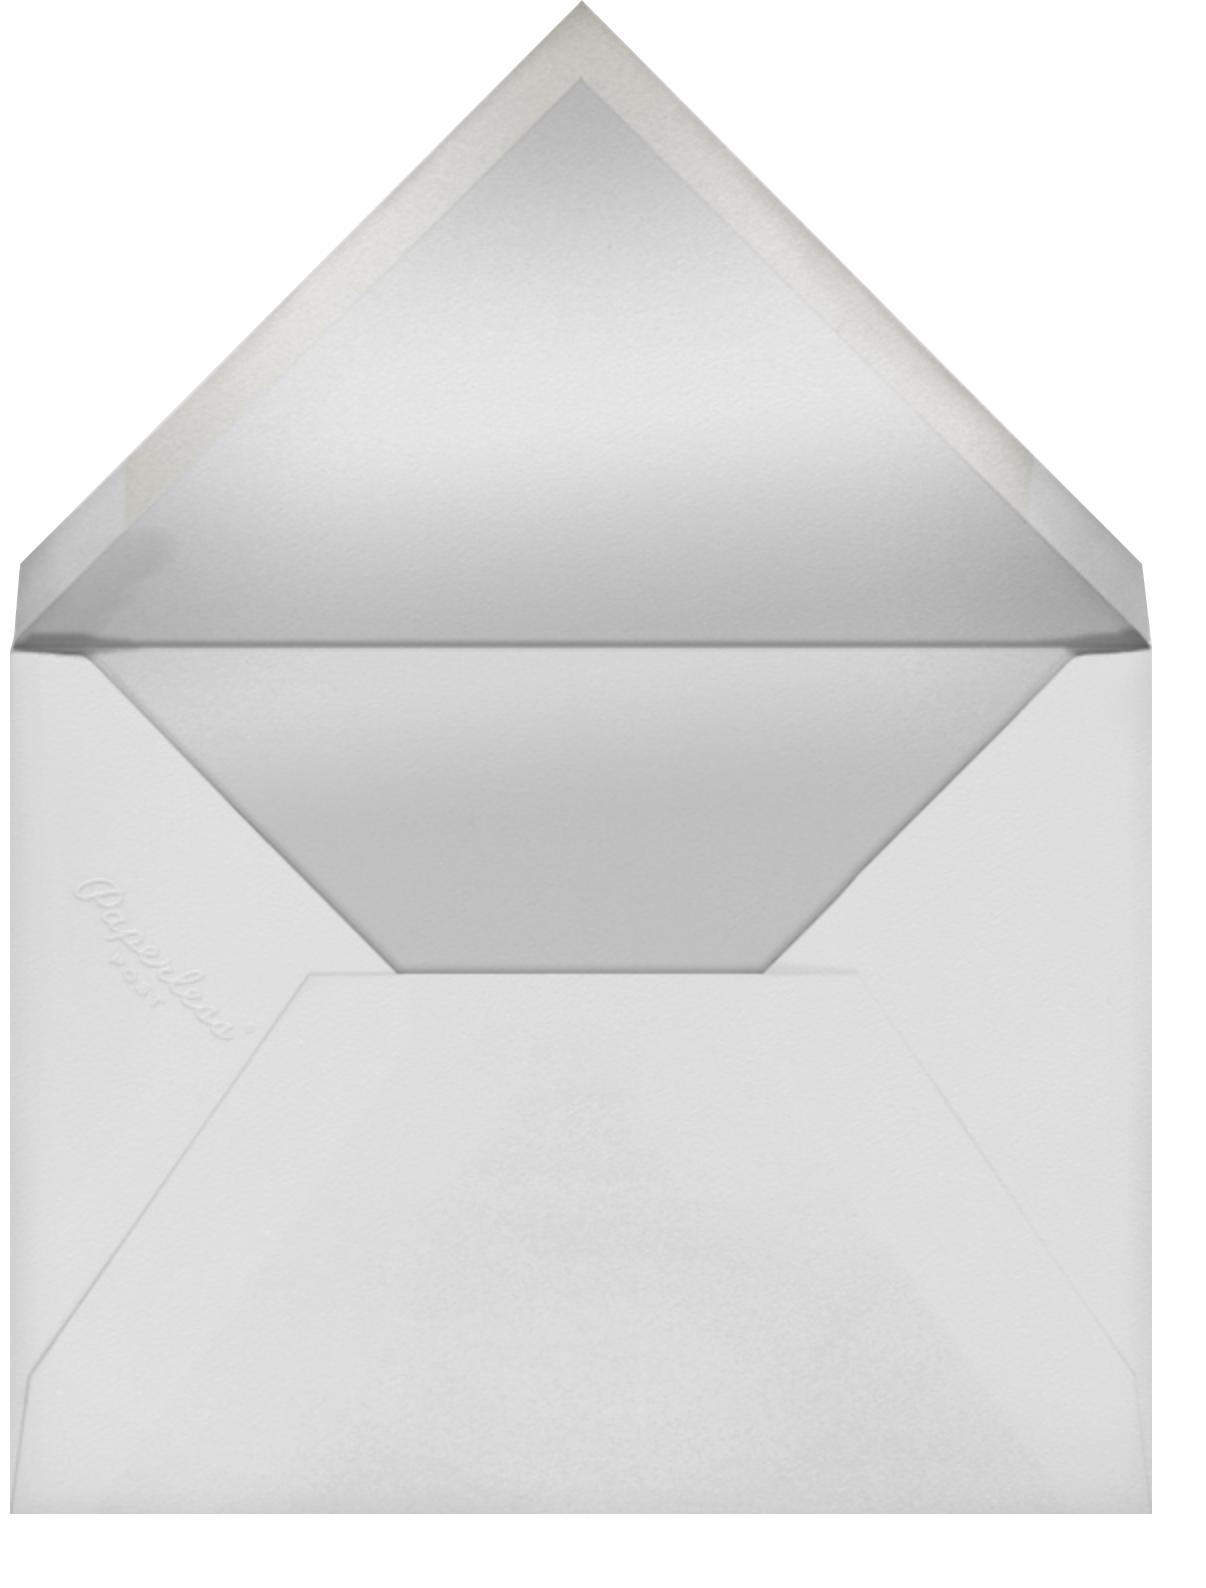 Emblem (Menu) - Flame - Bernard Maisner - Menus - envelope back